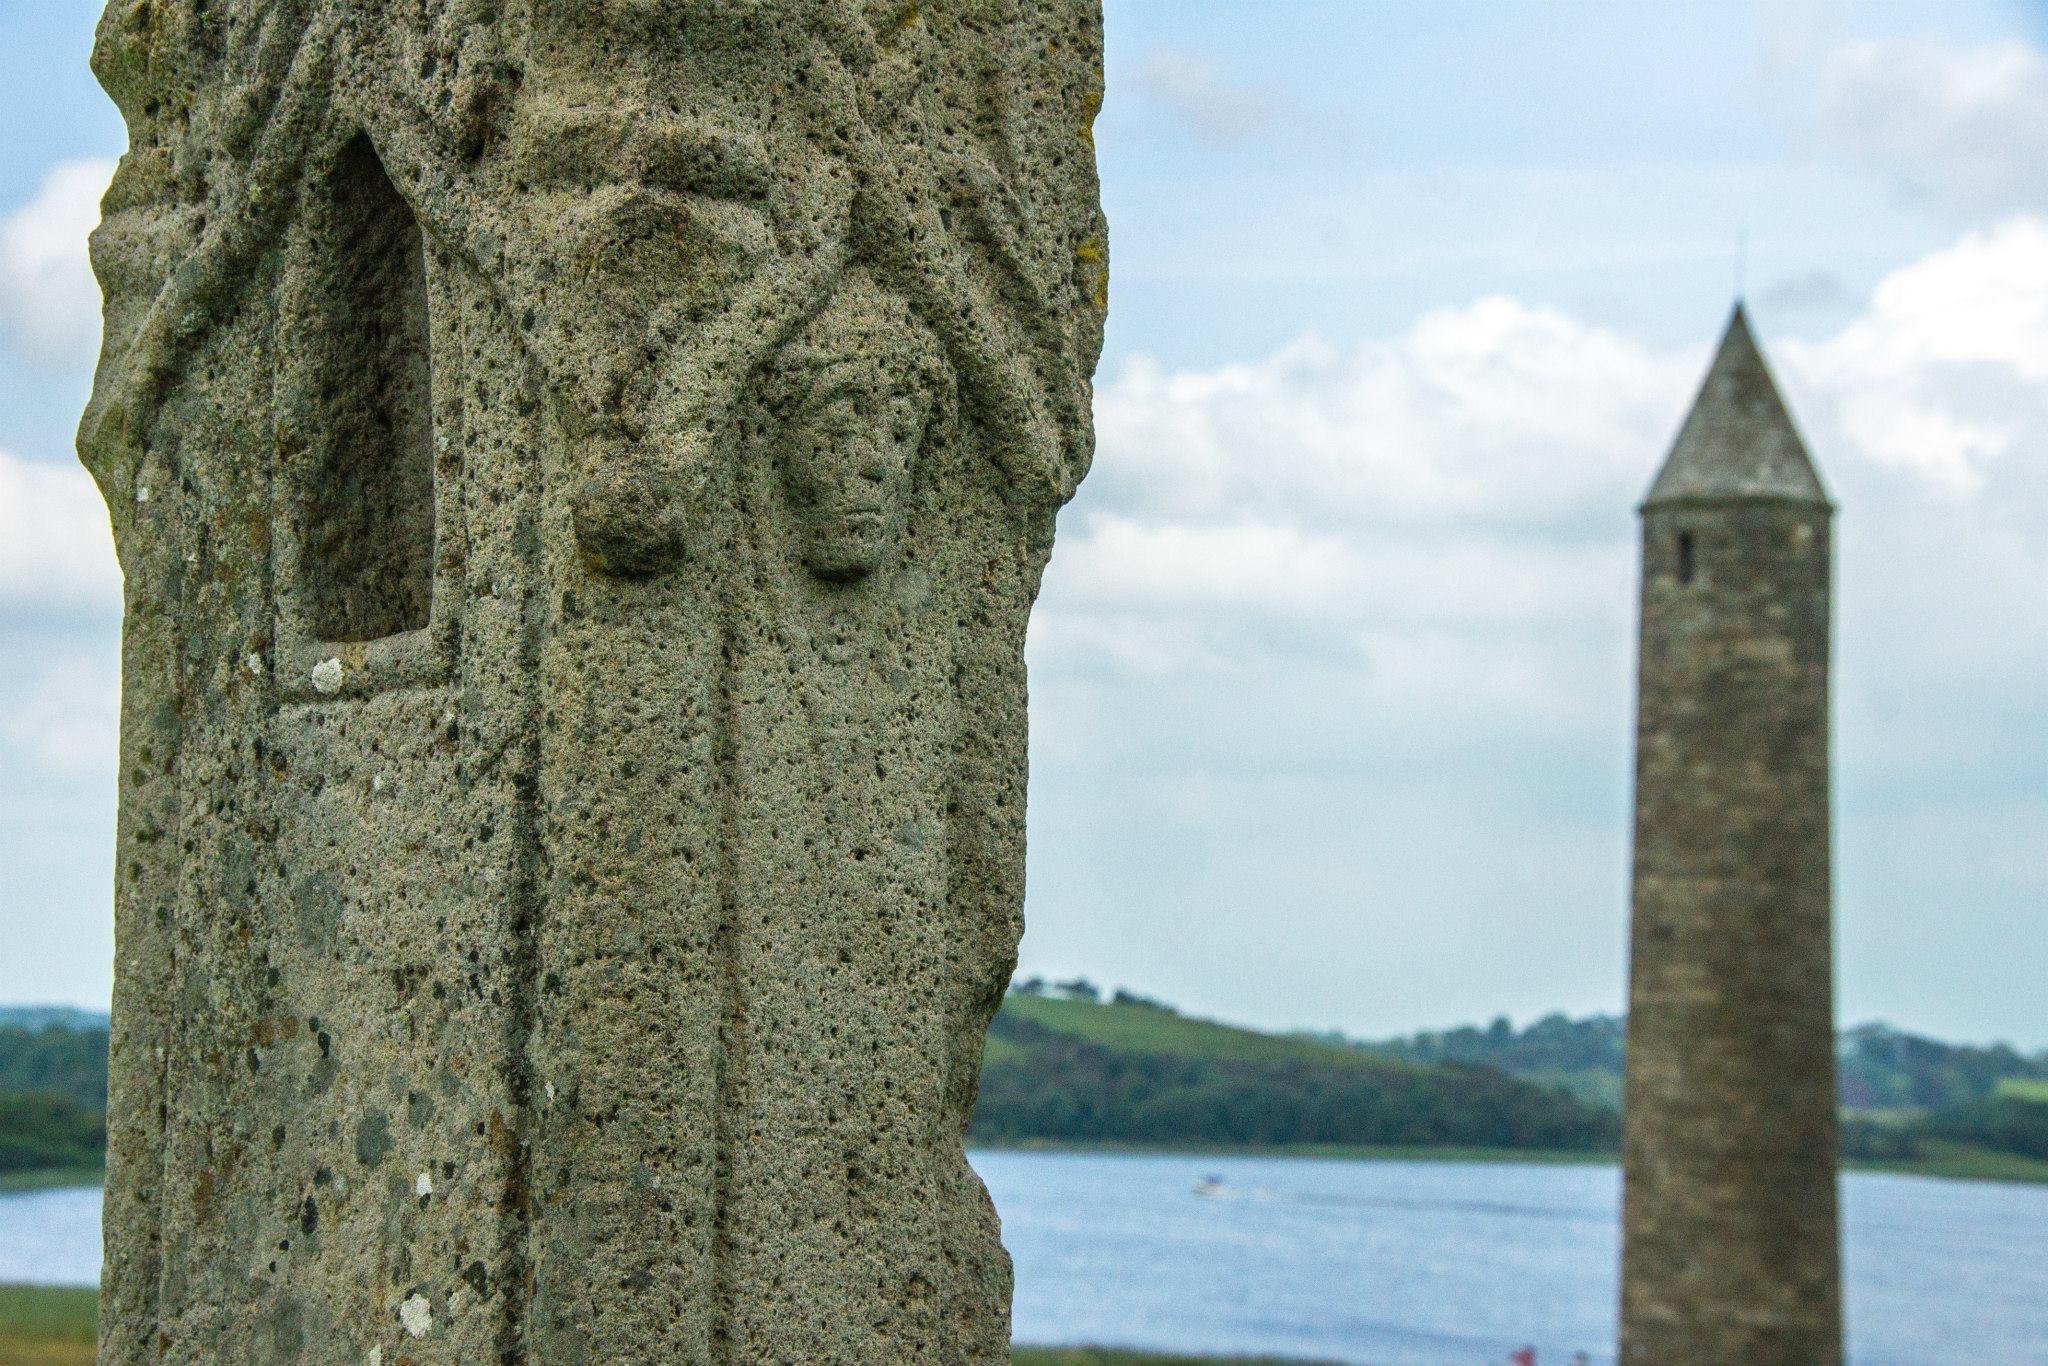 Devenish Island cross closeup and round tower.